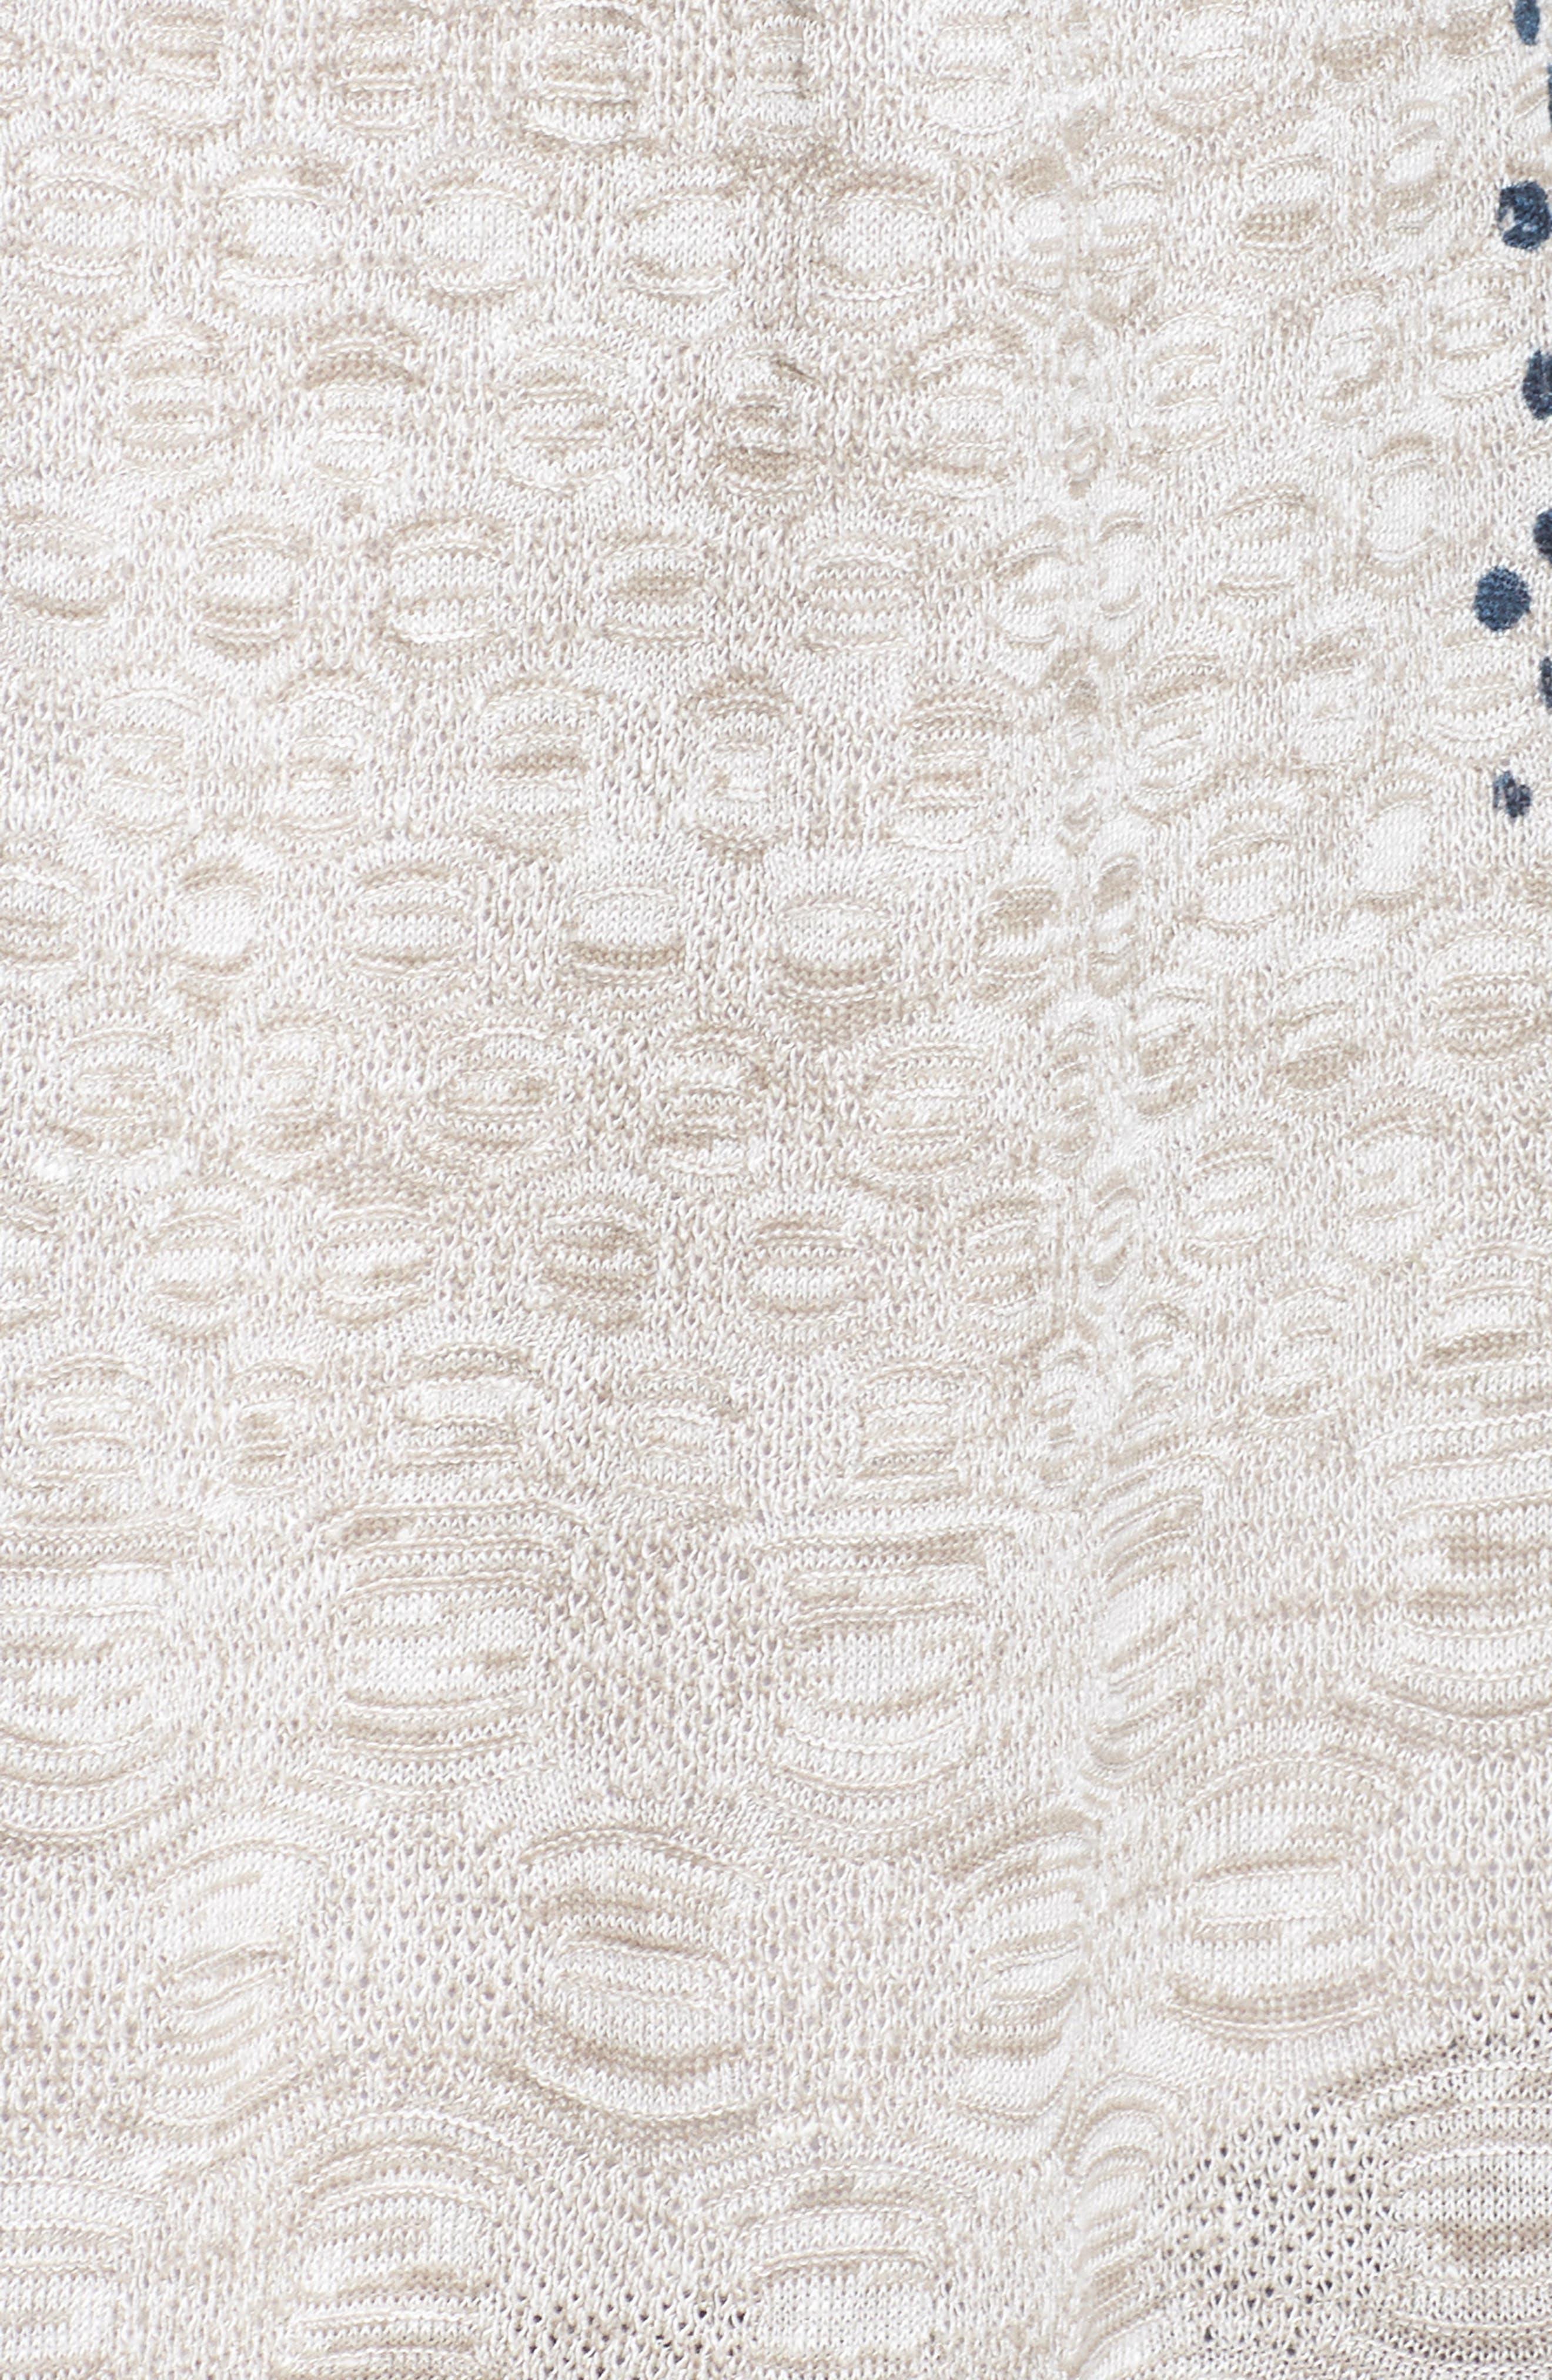 Bustle Linen Blend Cardigan,                             Alternate thumbnail 5, color,                             MULTI